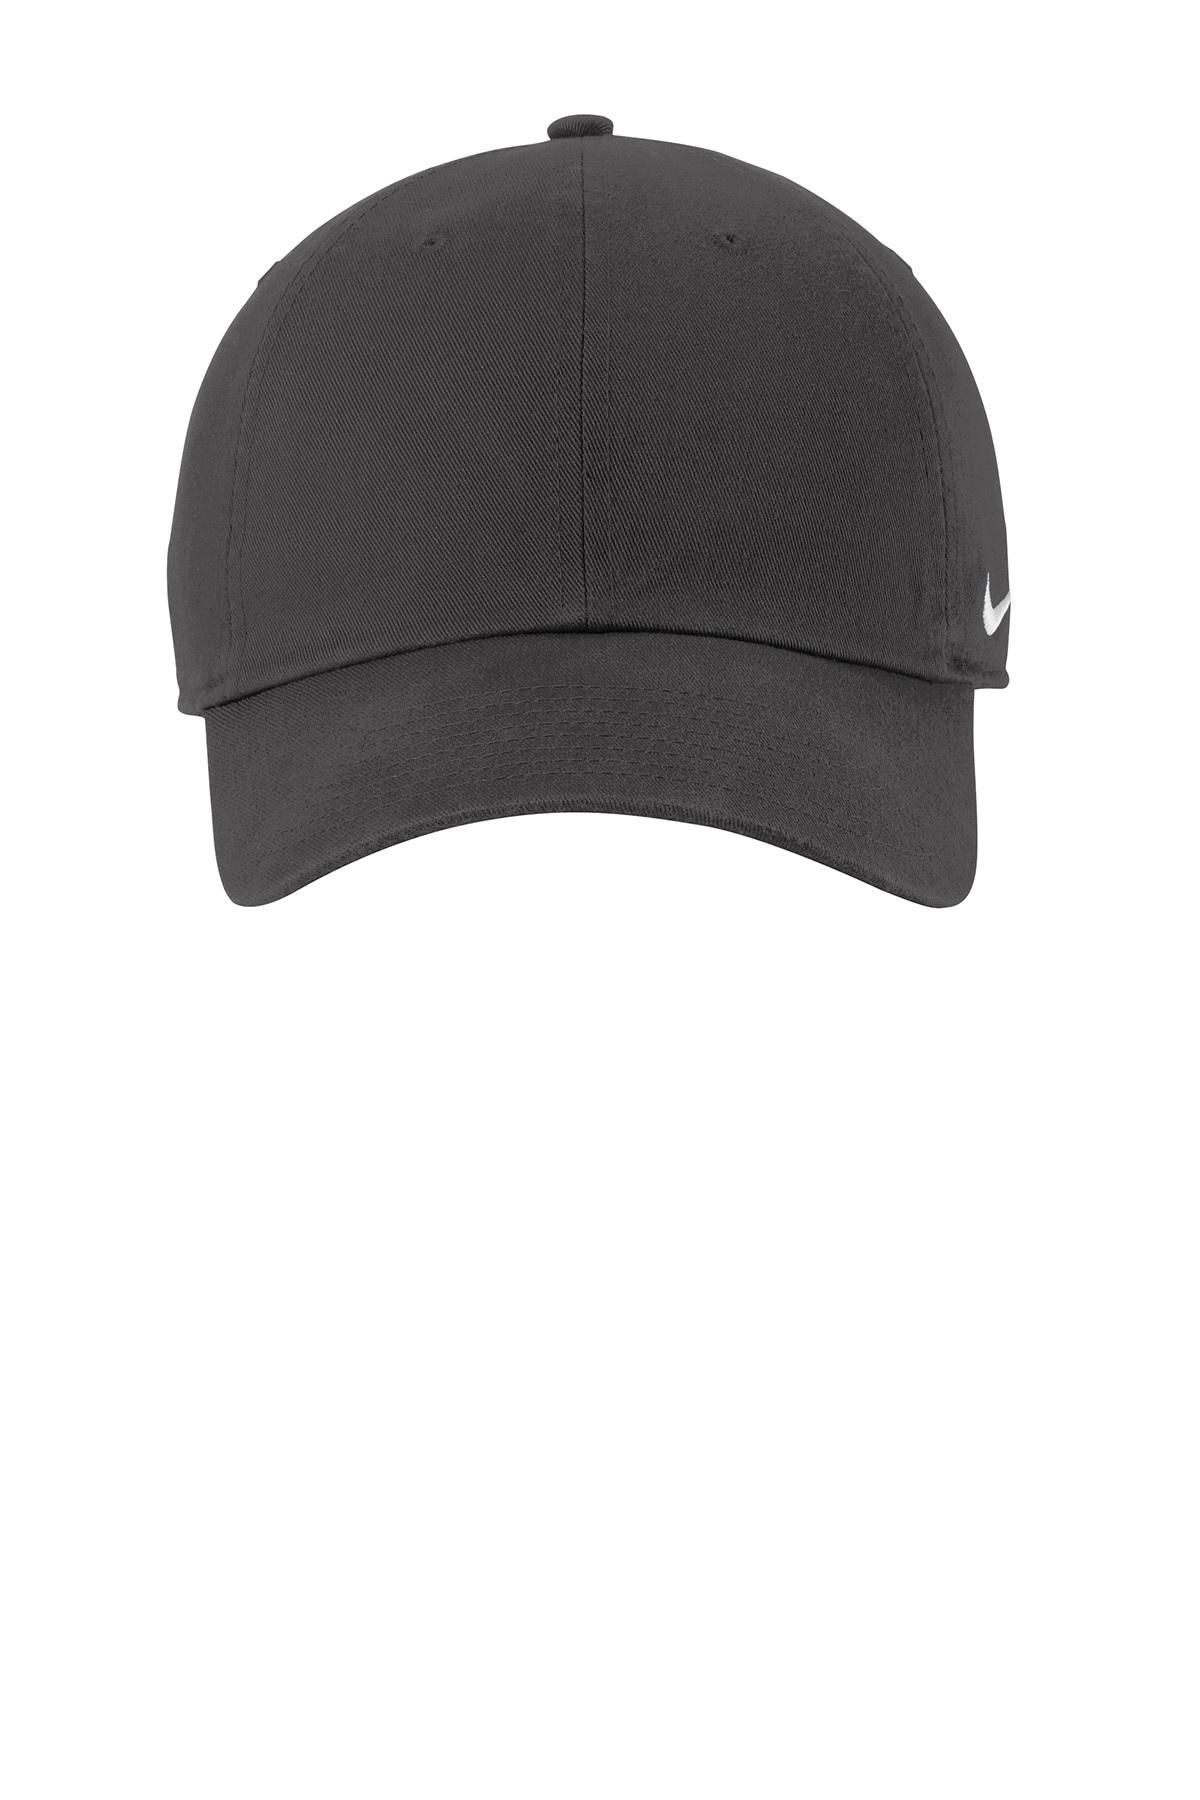 Nike 102699 - Heritage 86 Cap